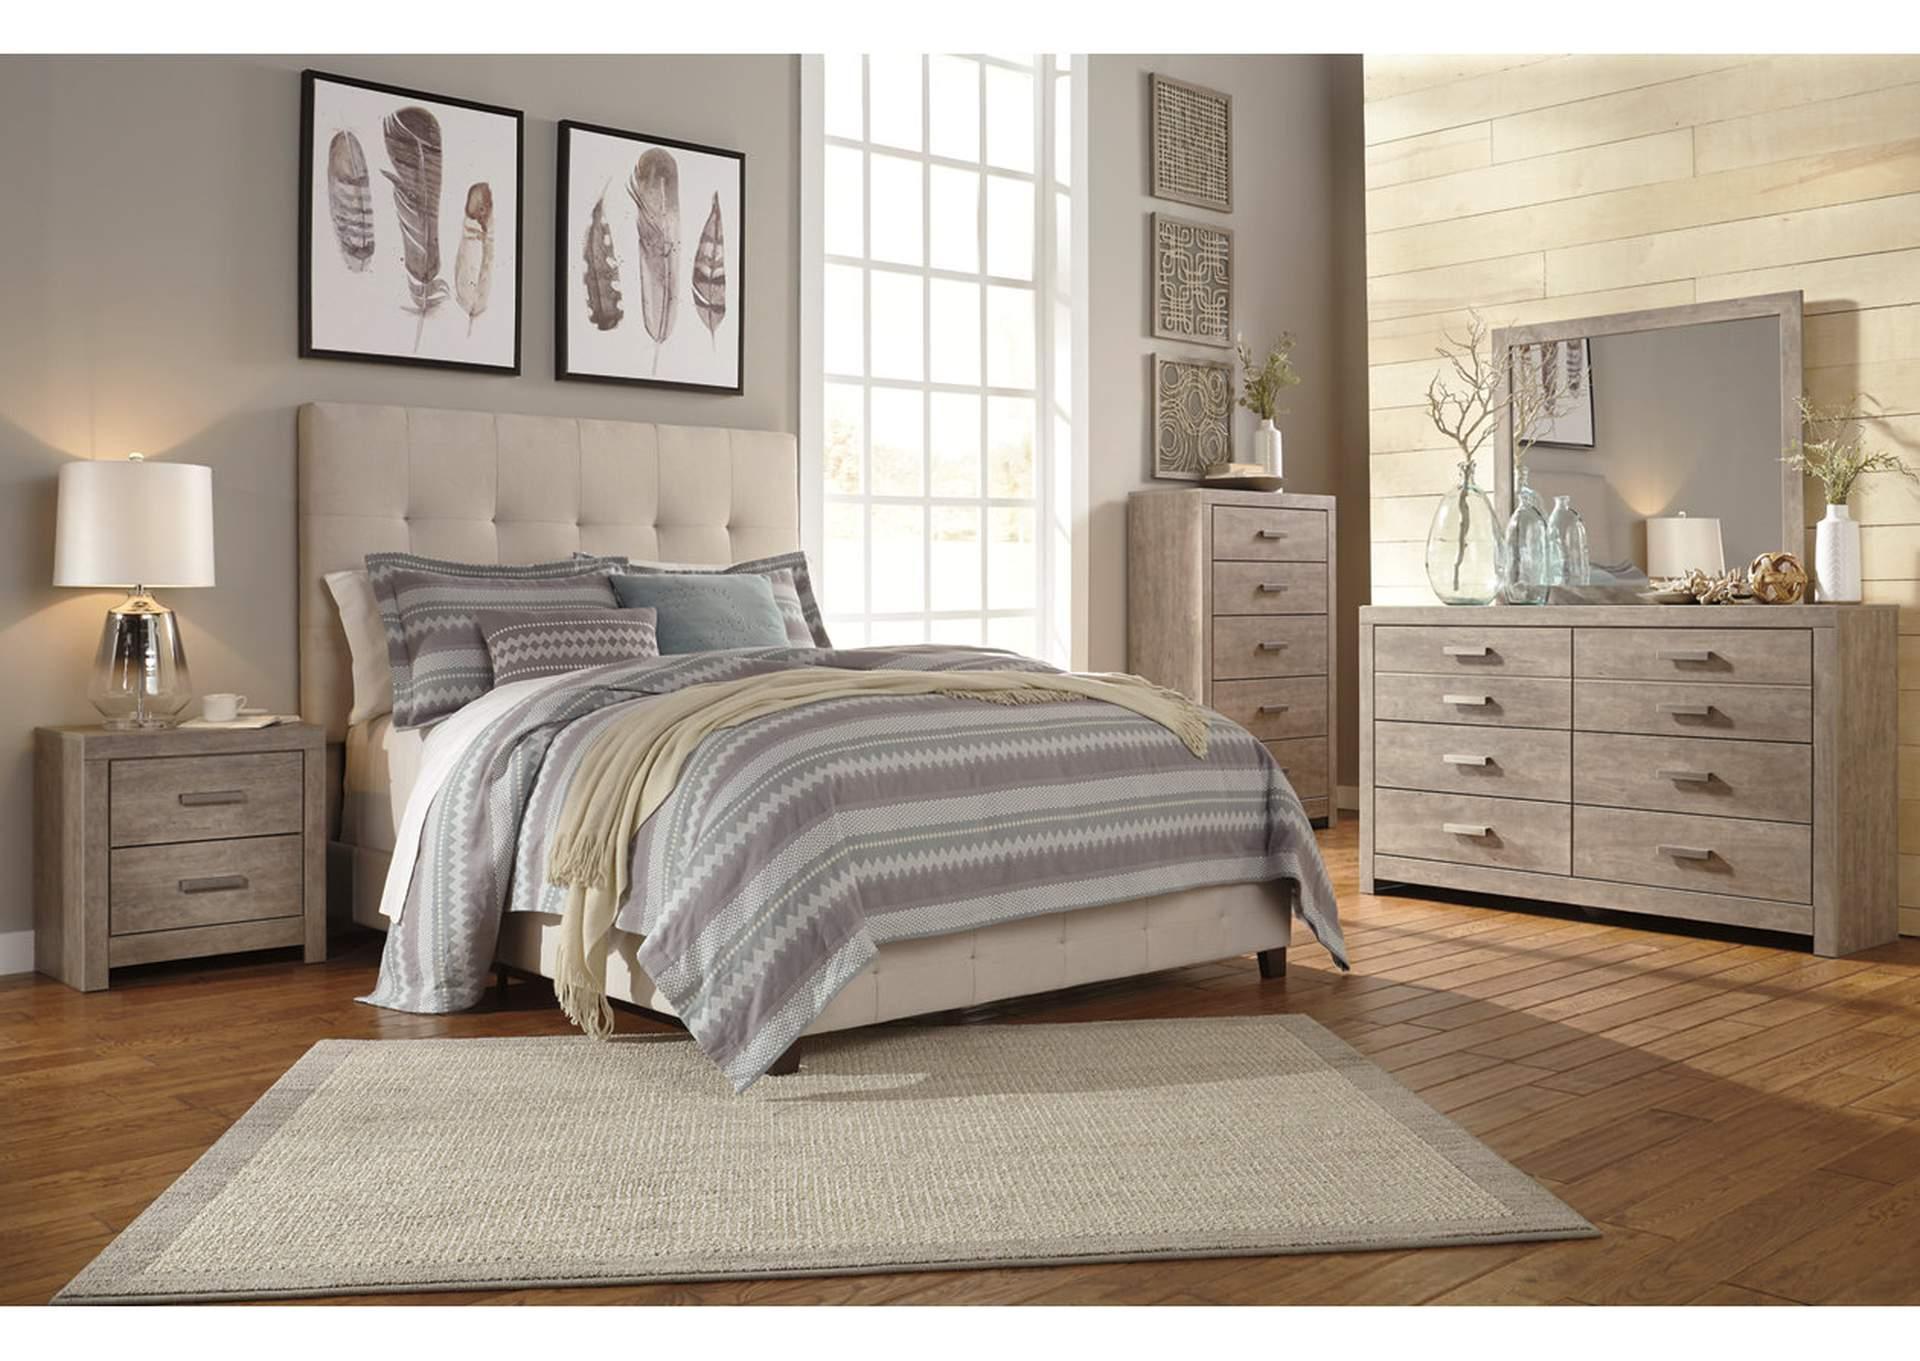 Martinez Furniture Appliance Mcallen Tx Beige Queen Upholstered Bed